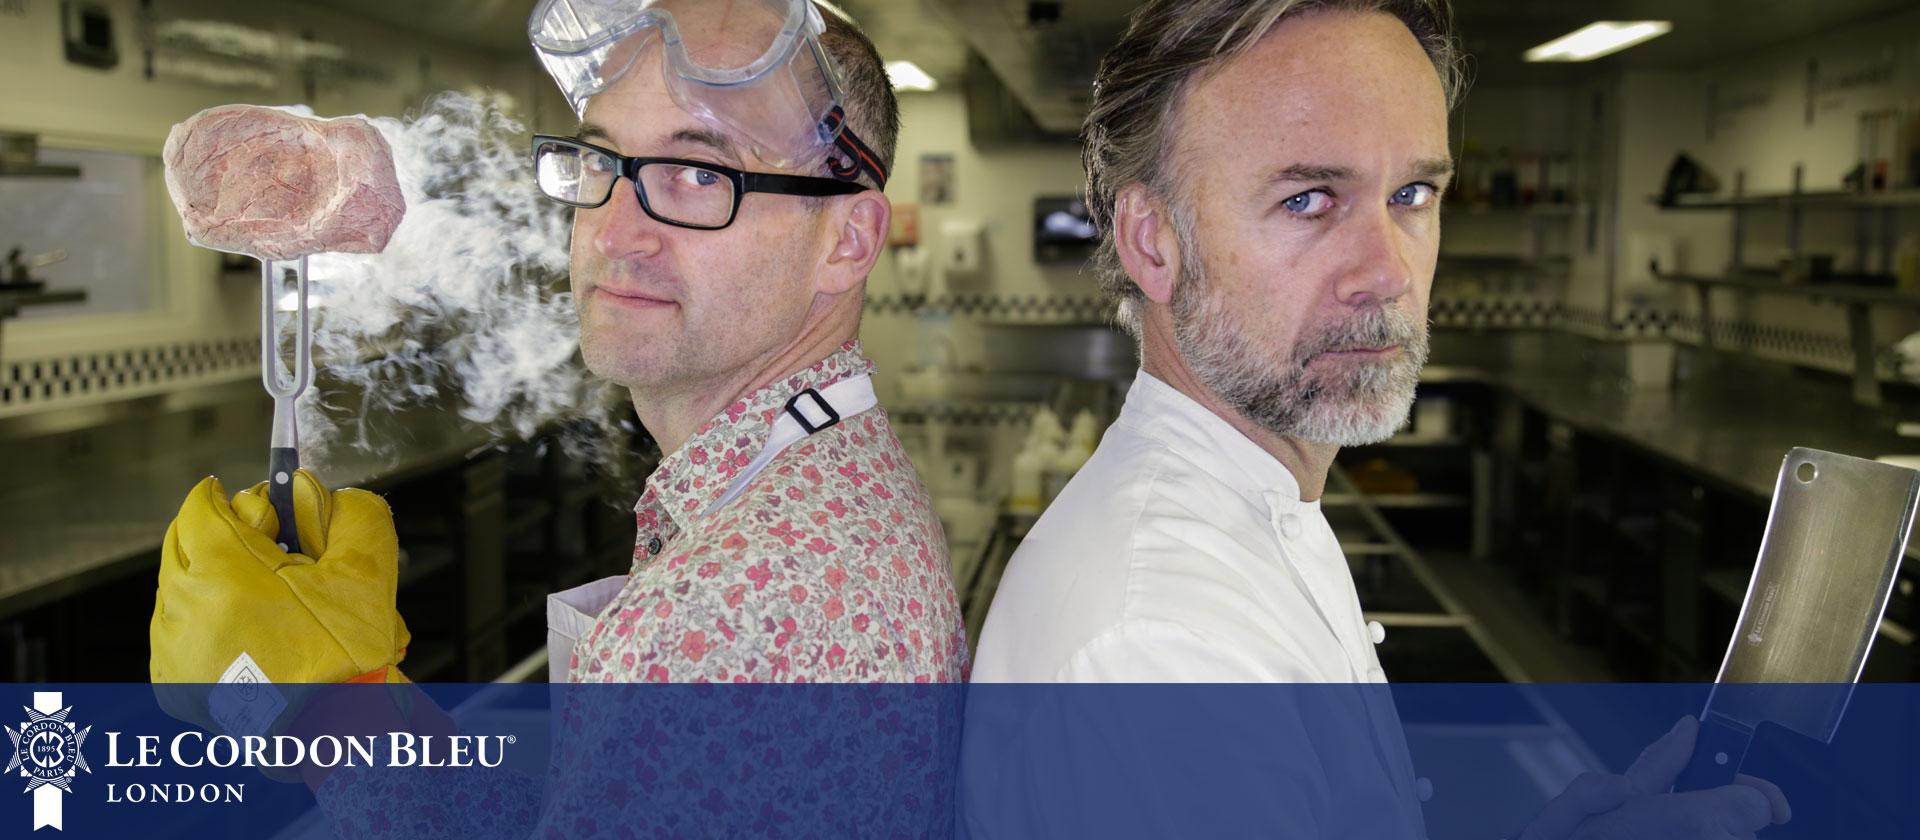 Chef vs Science BBC Four programme at Le Cordon Bleu London